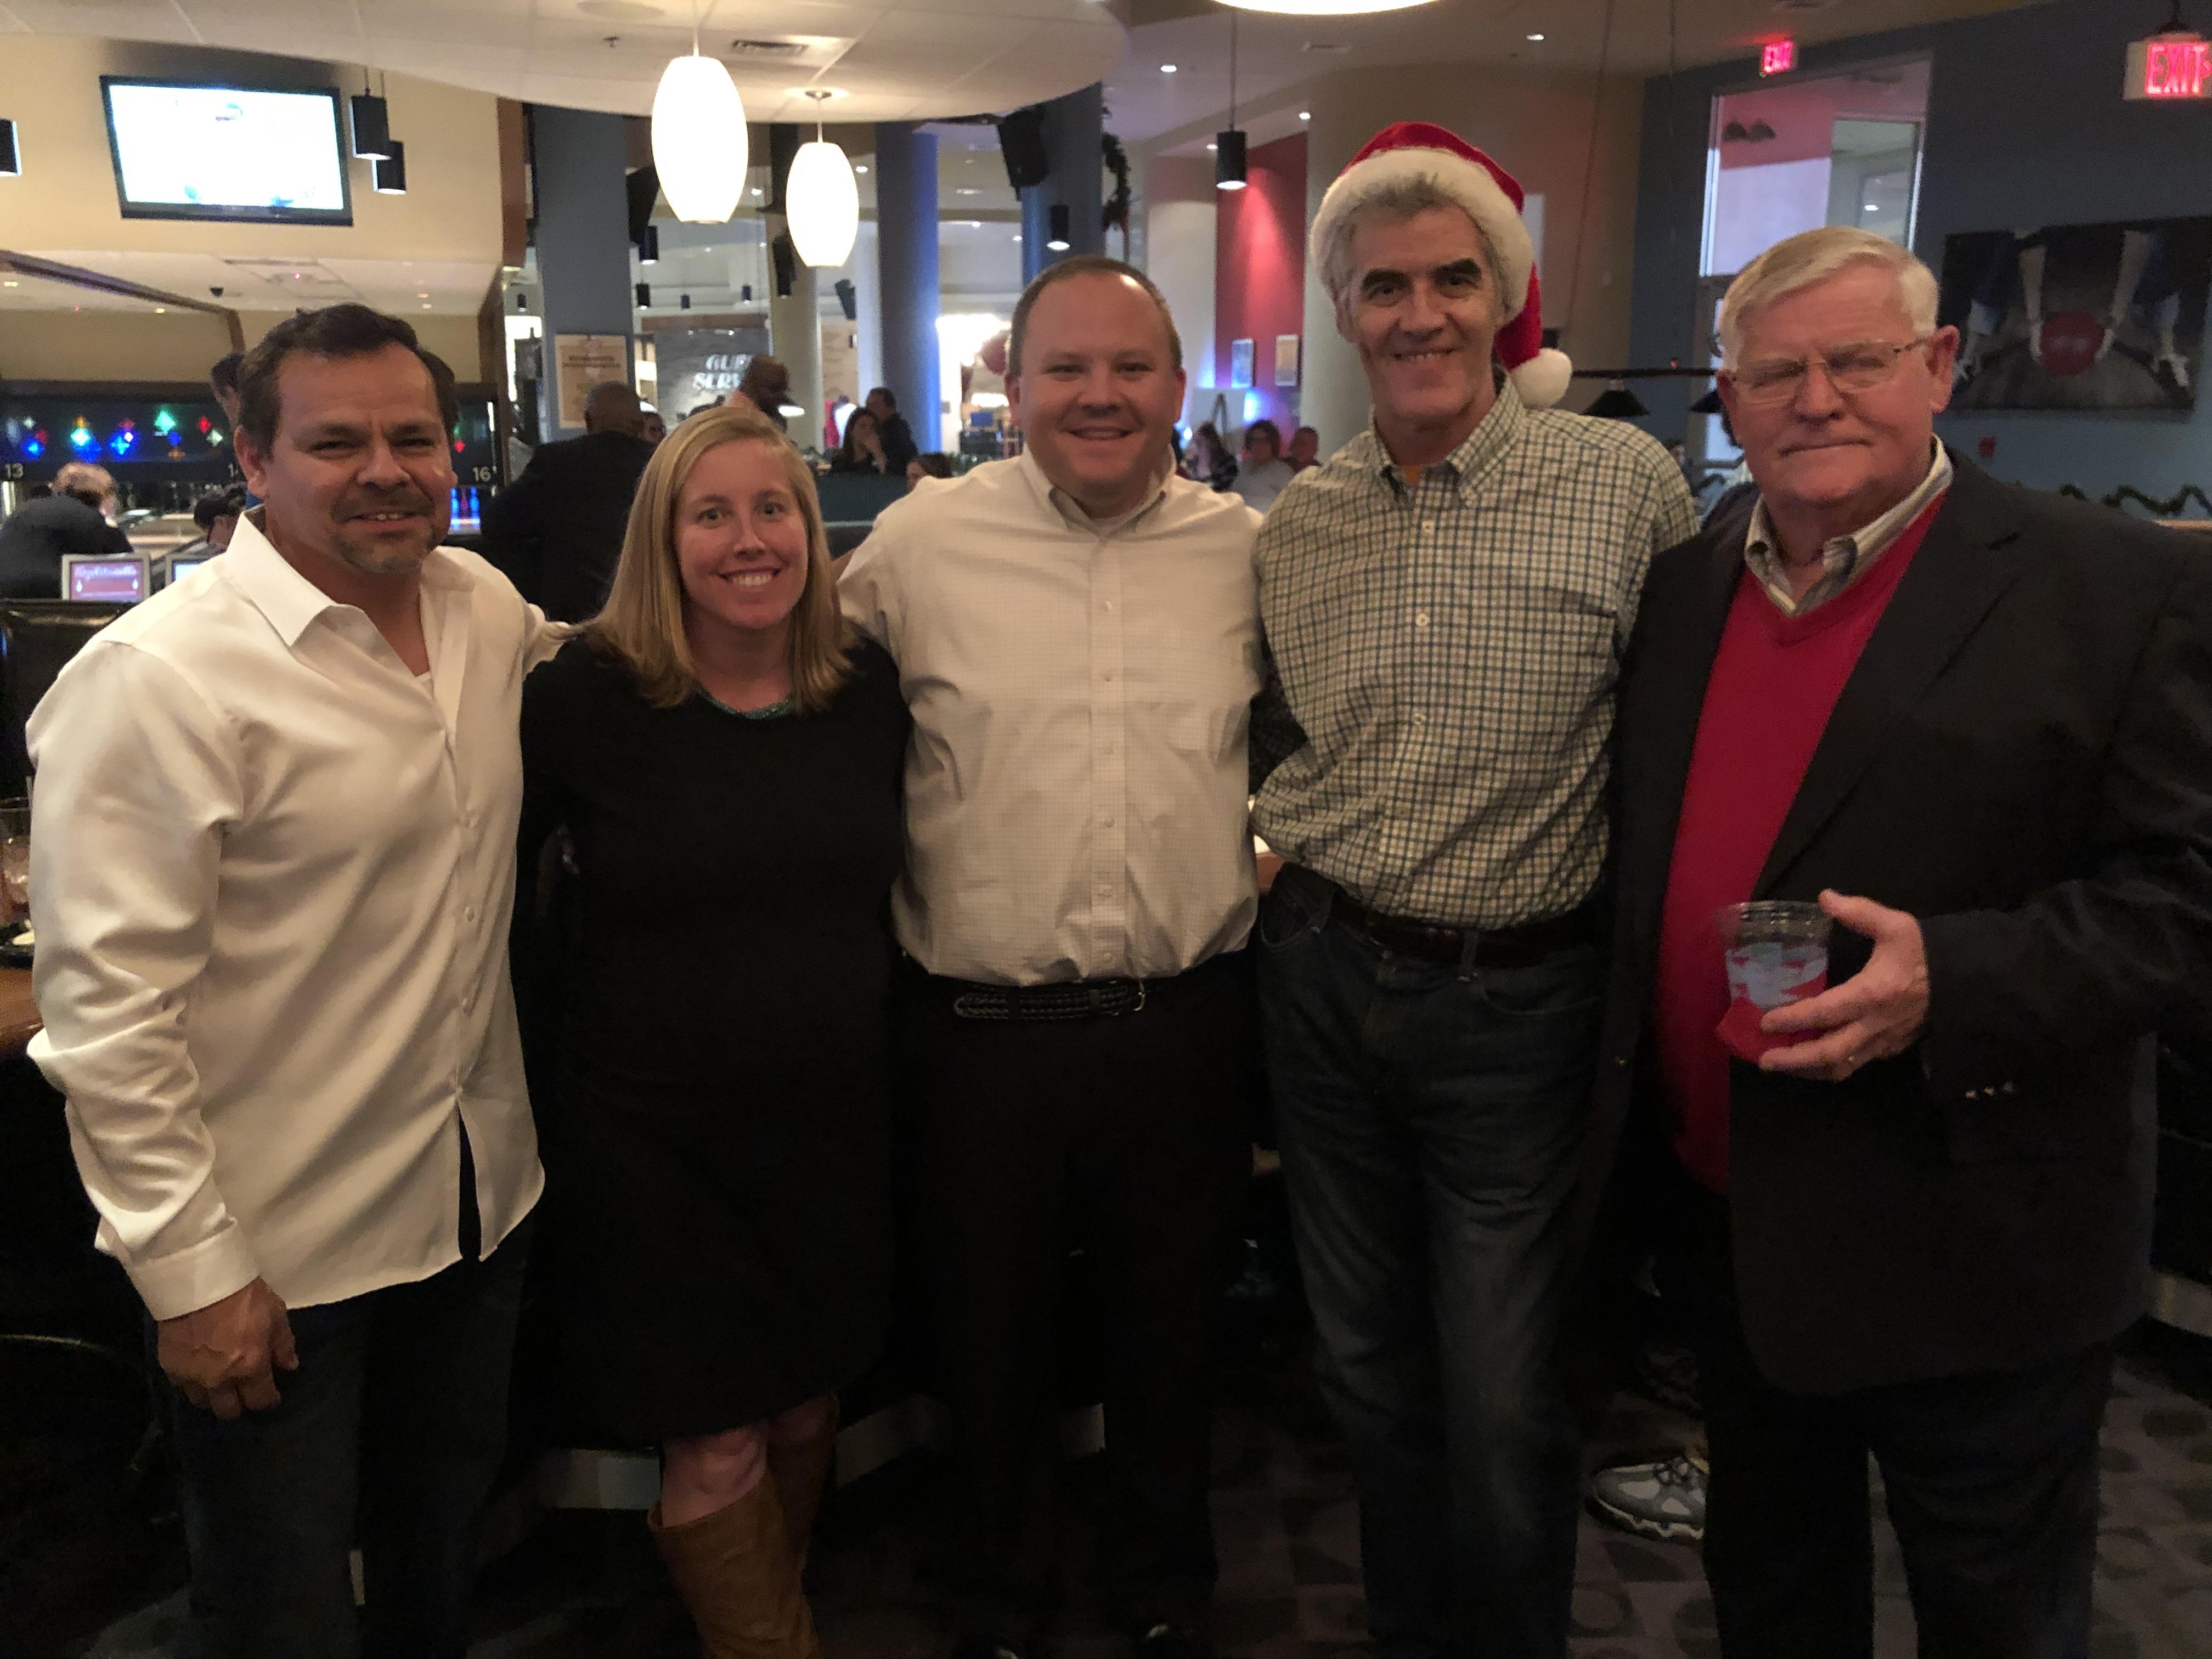 Hilldrup Stafford Celebrates The Holidays Hilldrup